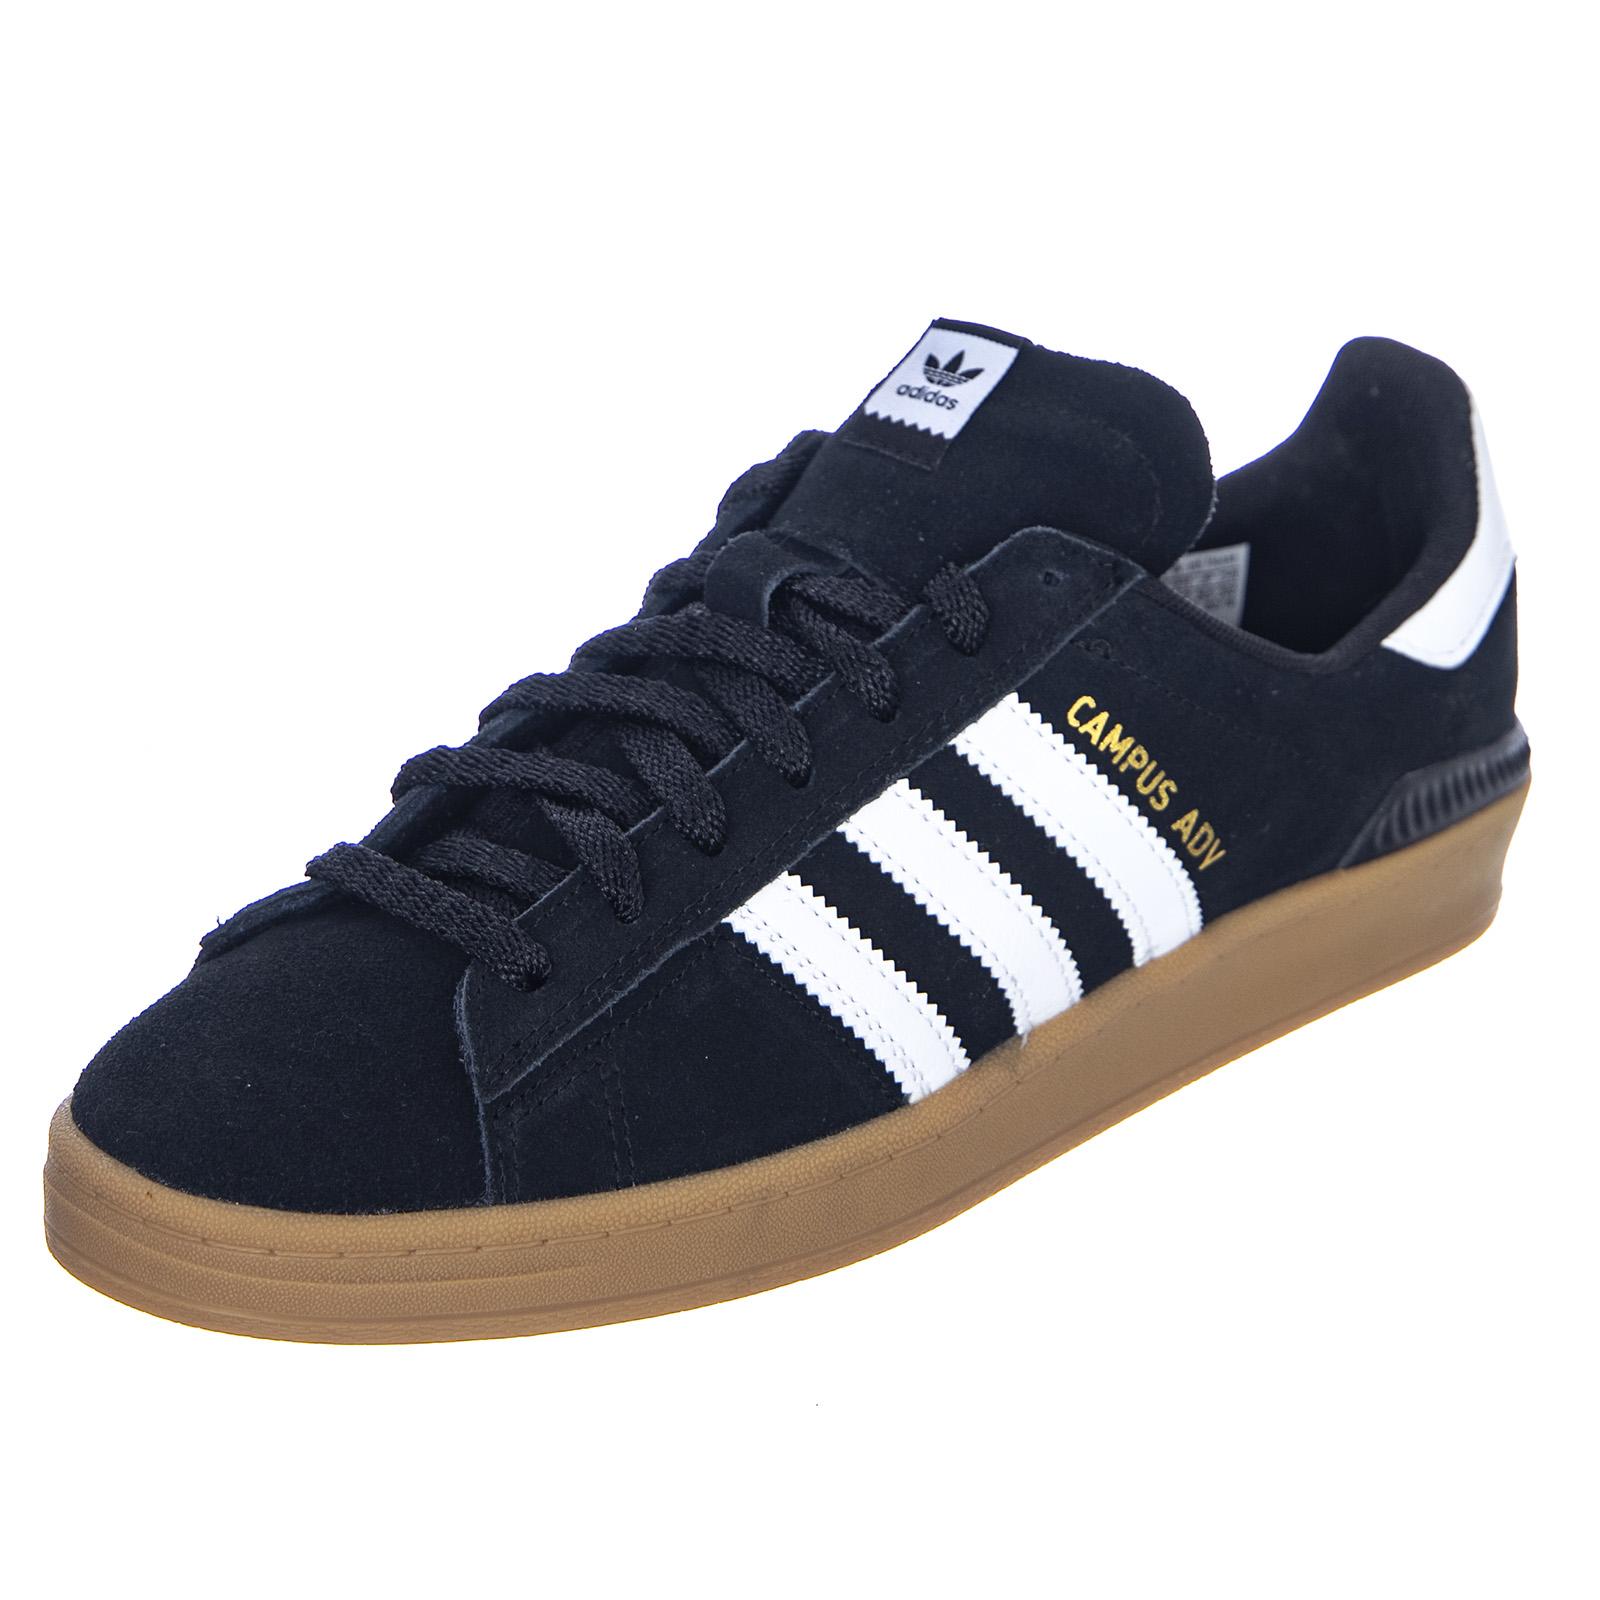 Dettagli su Adidas Campus Adv Core BlackWhiteGum4 Sneakers Basse Uomo Nero